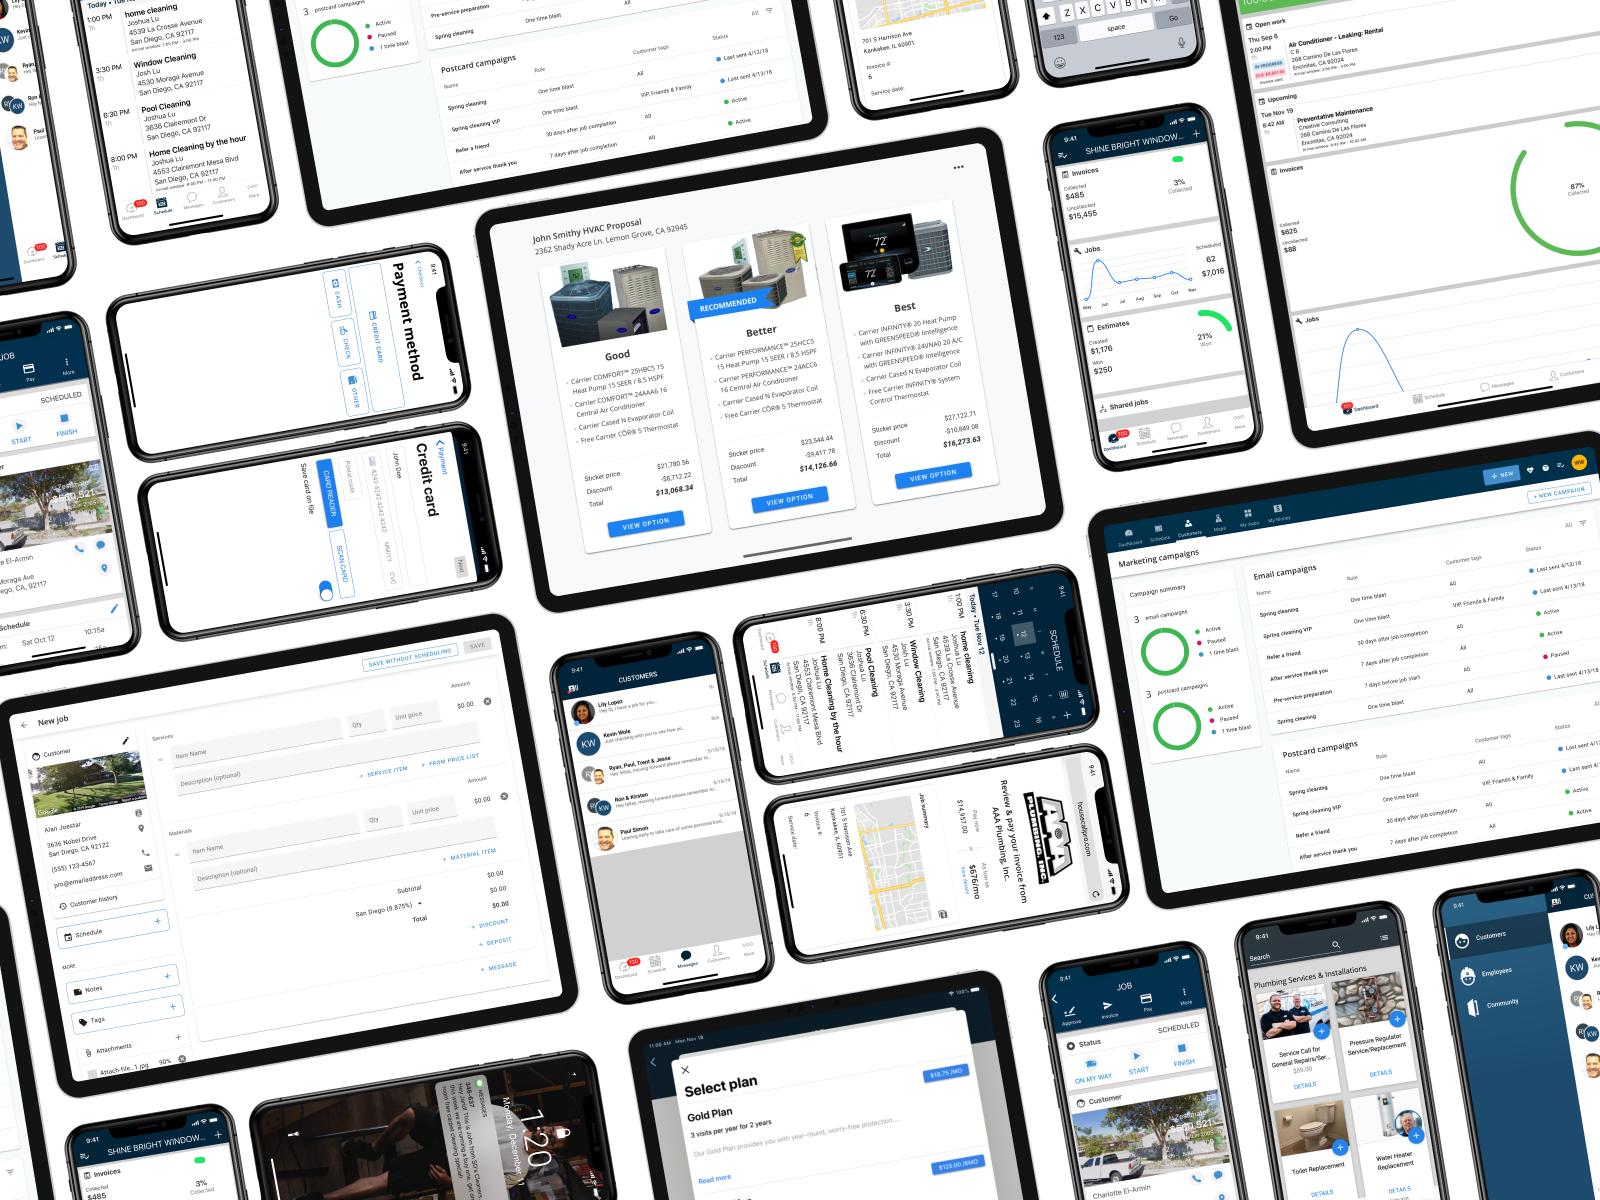 Web, Mobile, Tablet